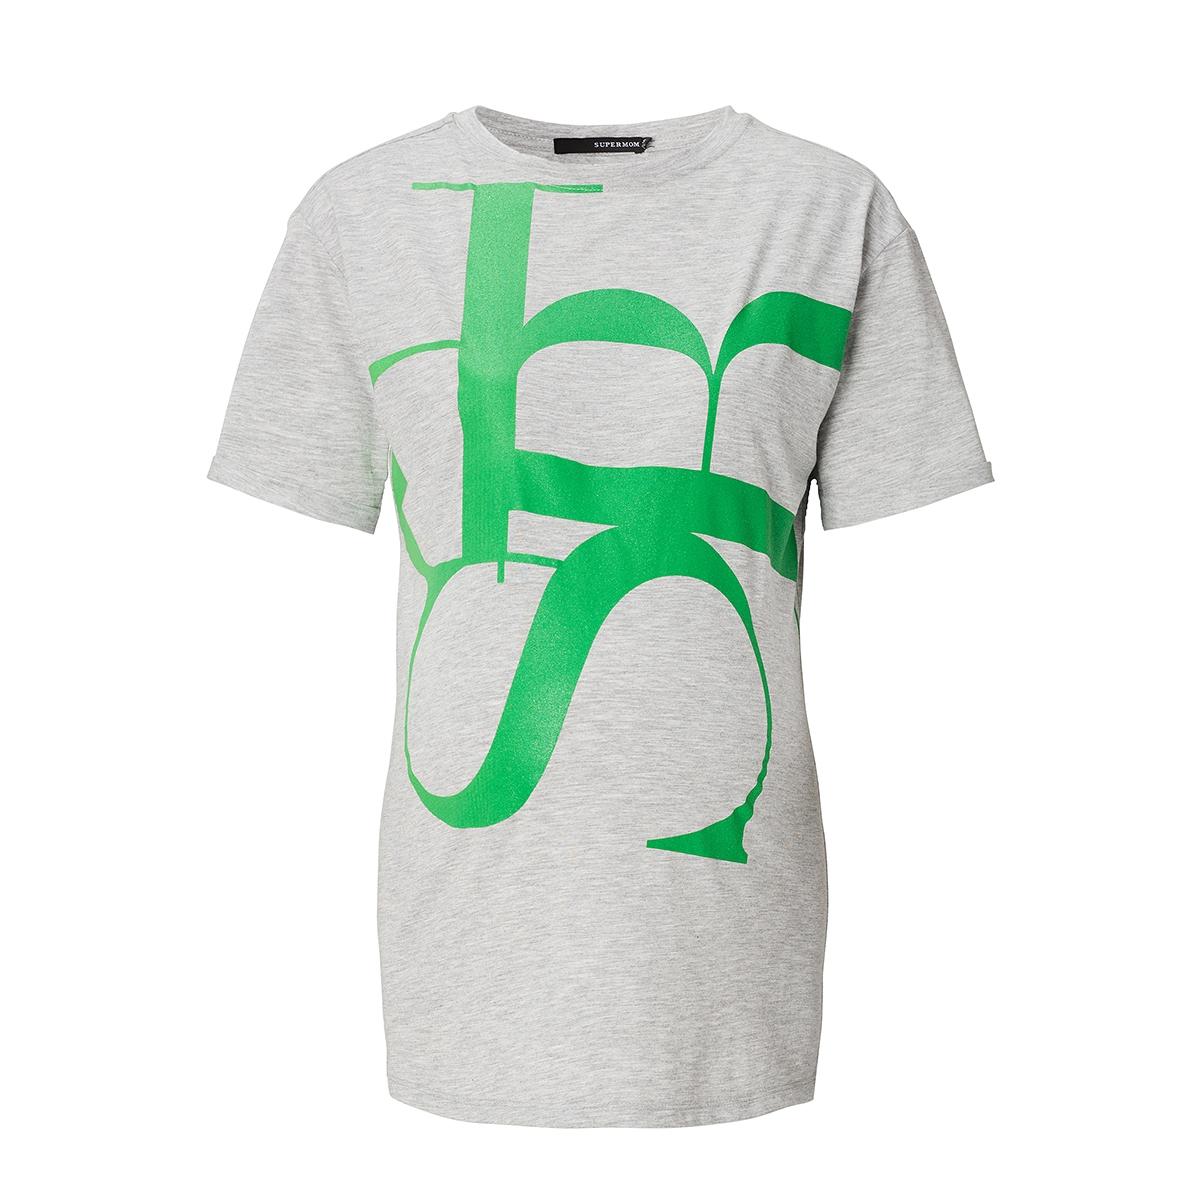 s0712 tee print supermom positie shirt light grey melange